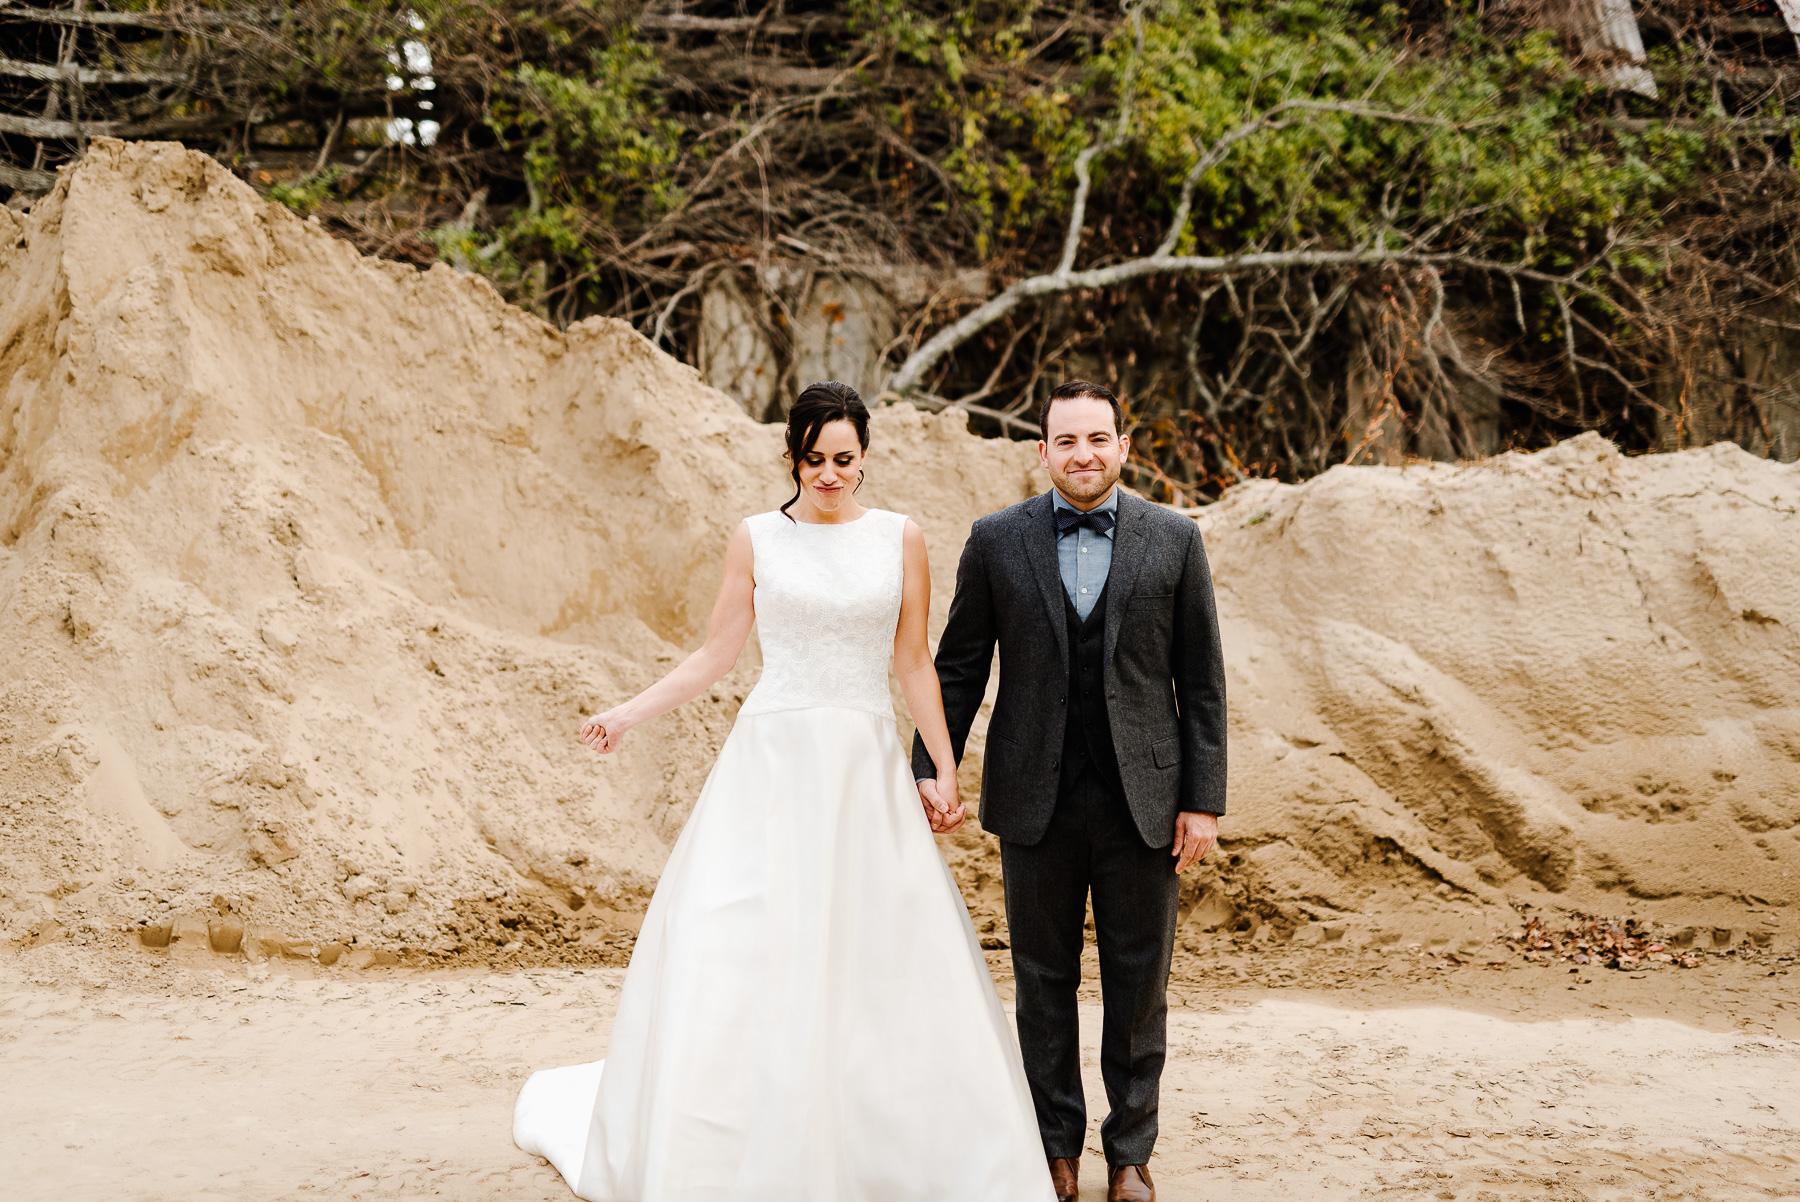 34-Laurita Winery Wedding New Jersey Wedding Photographer Laurita Winery Weddings Longbrook Photography.jpg